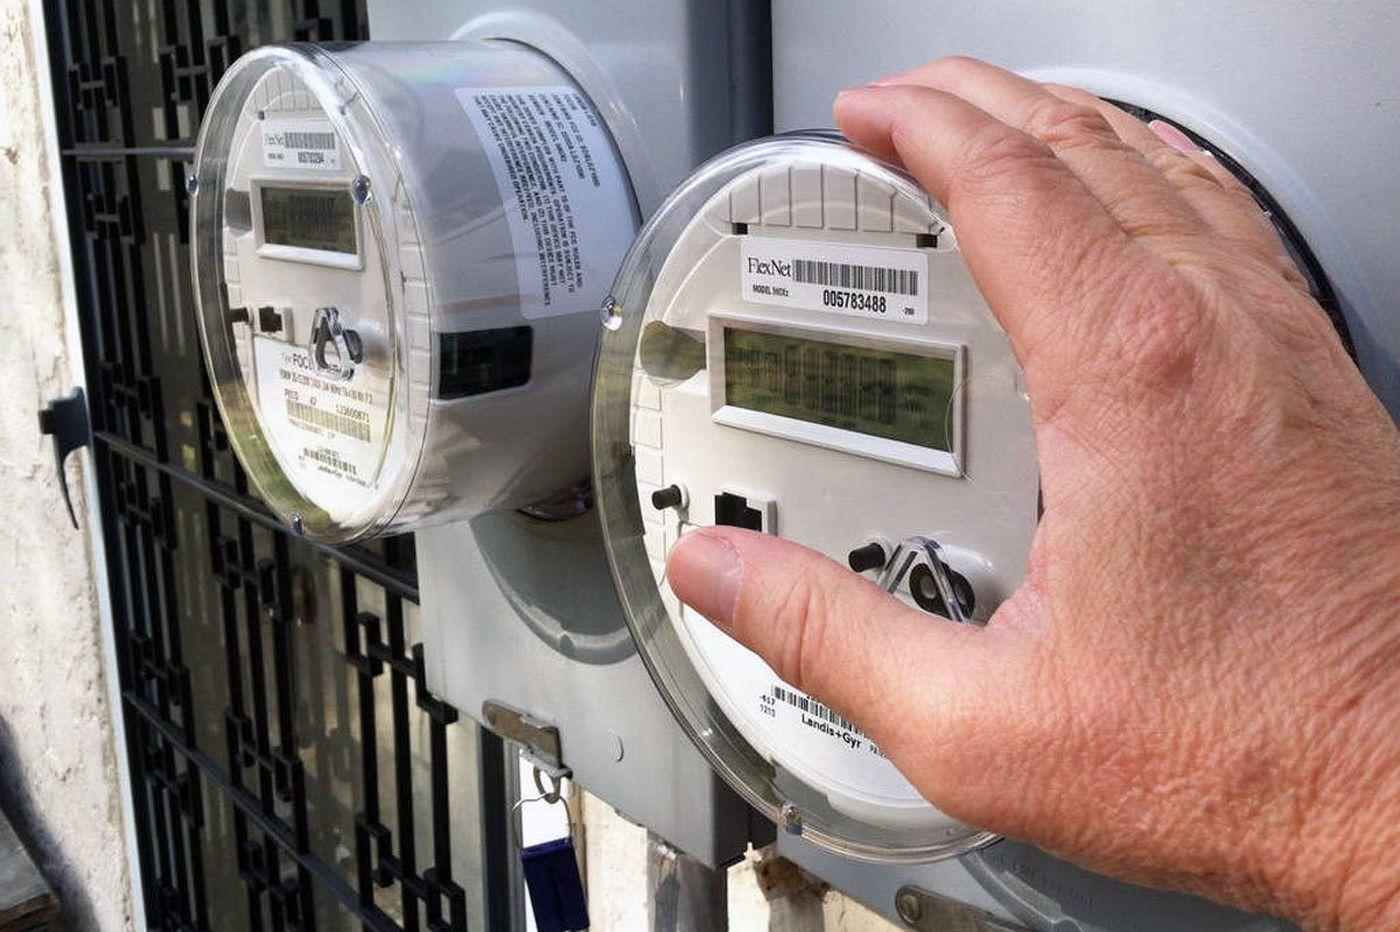 Срок службы электросчетчика: когда нужно менять электросчетчик в квартире